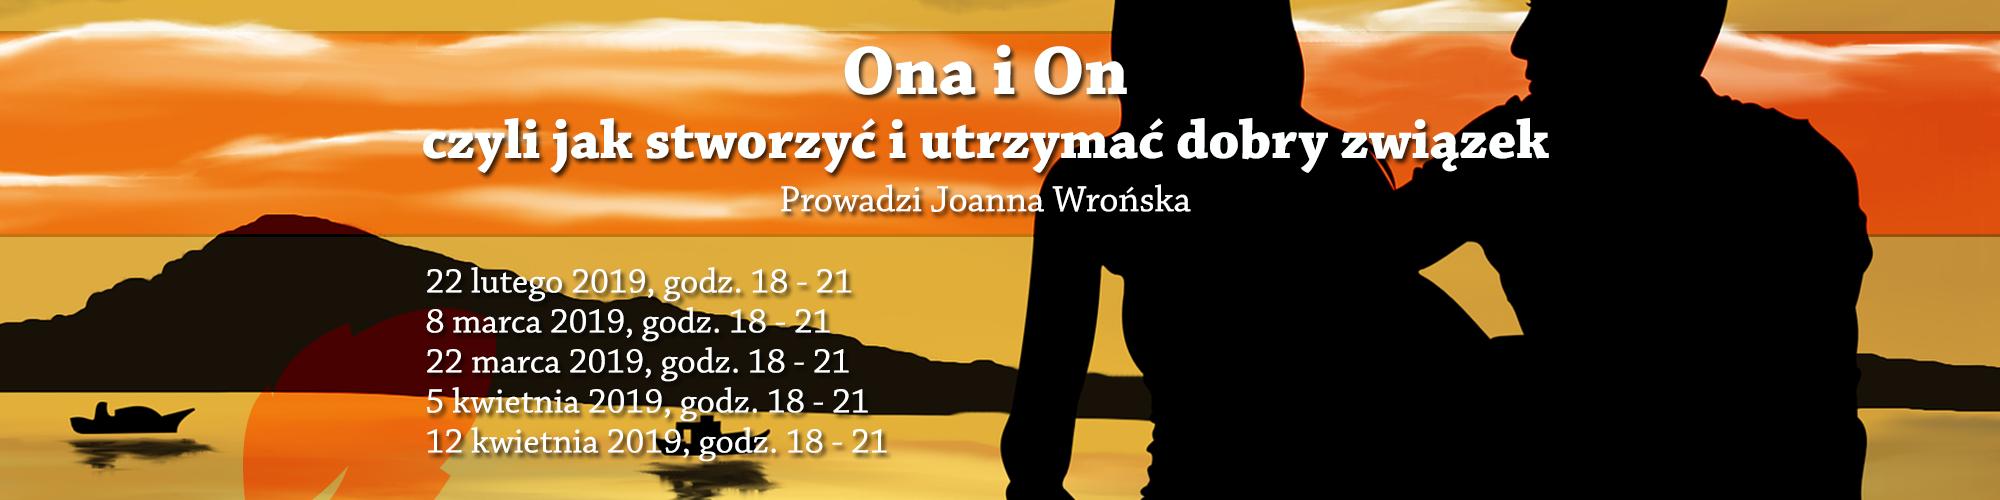 oniona-banner